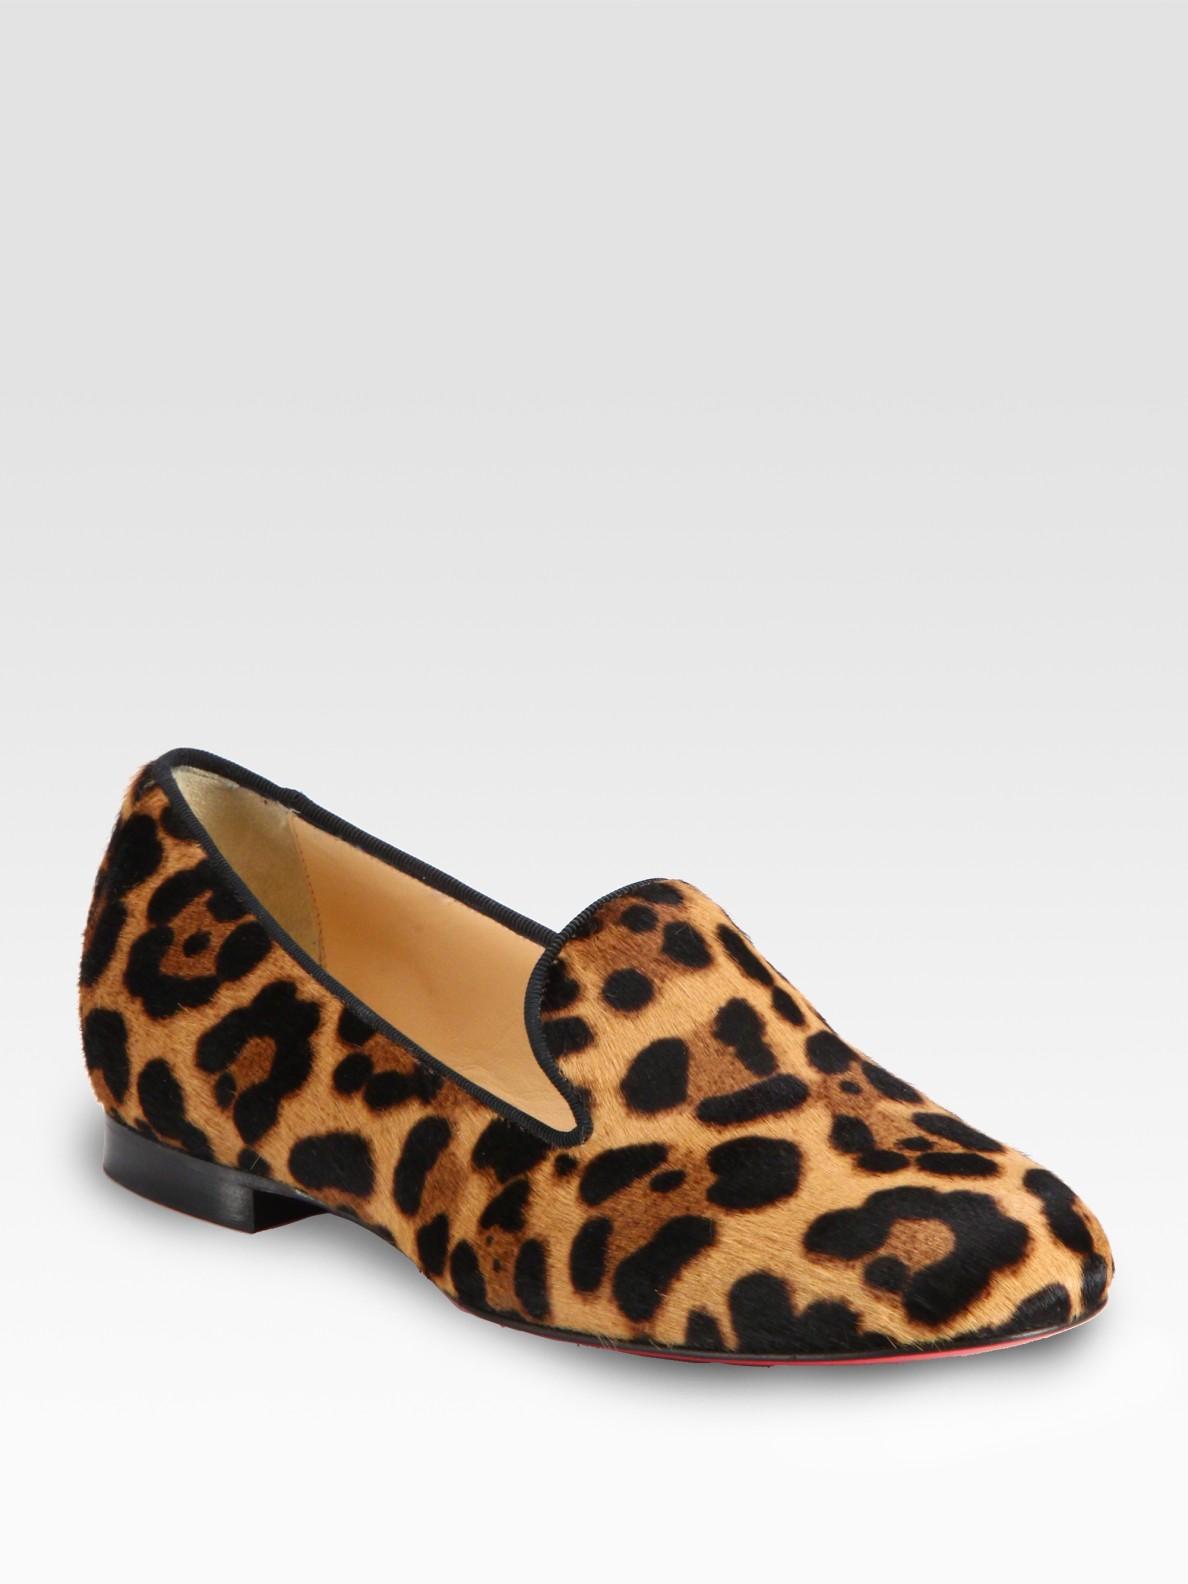 Lyst - Christian Louboutin Leopardprint Pony Hair Loafers d12556c2d664